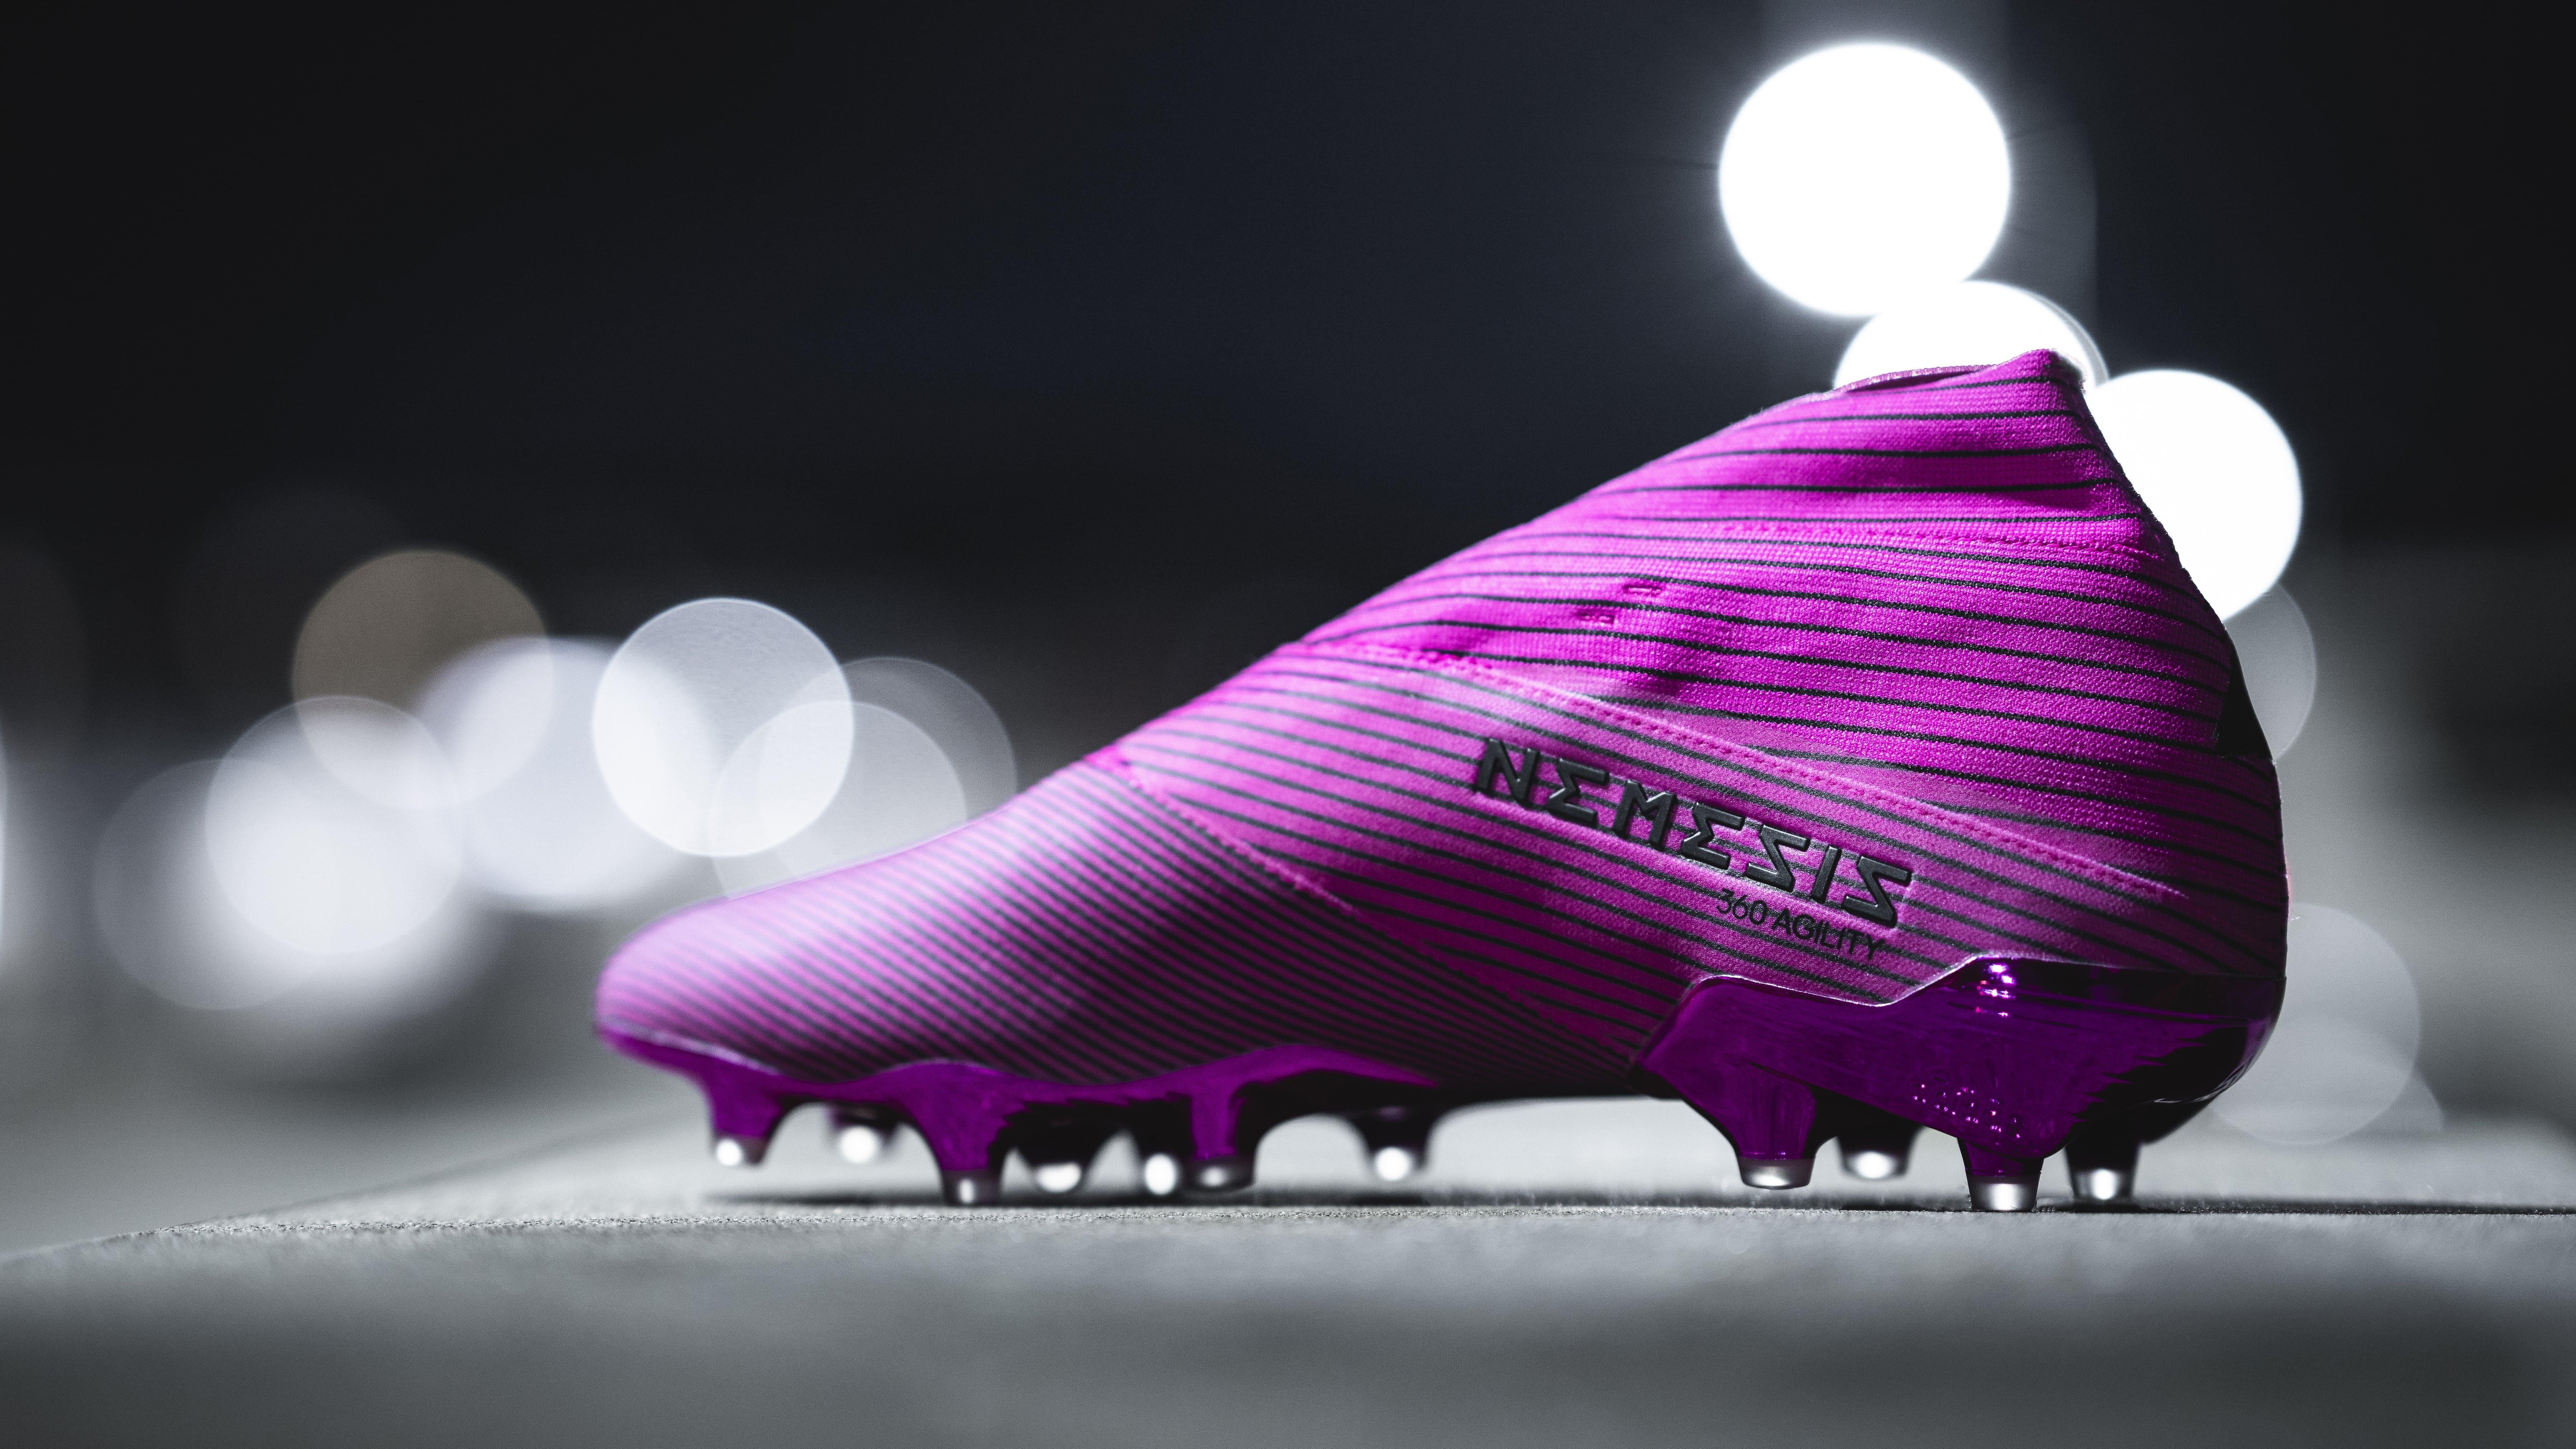 Ecco le nuove scarpe di Dybala e Messi   Foto Sportmediaset